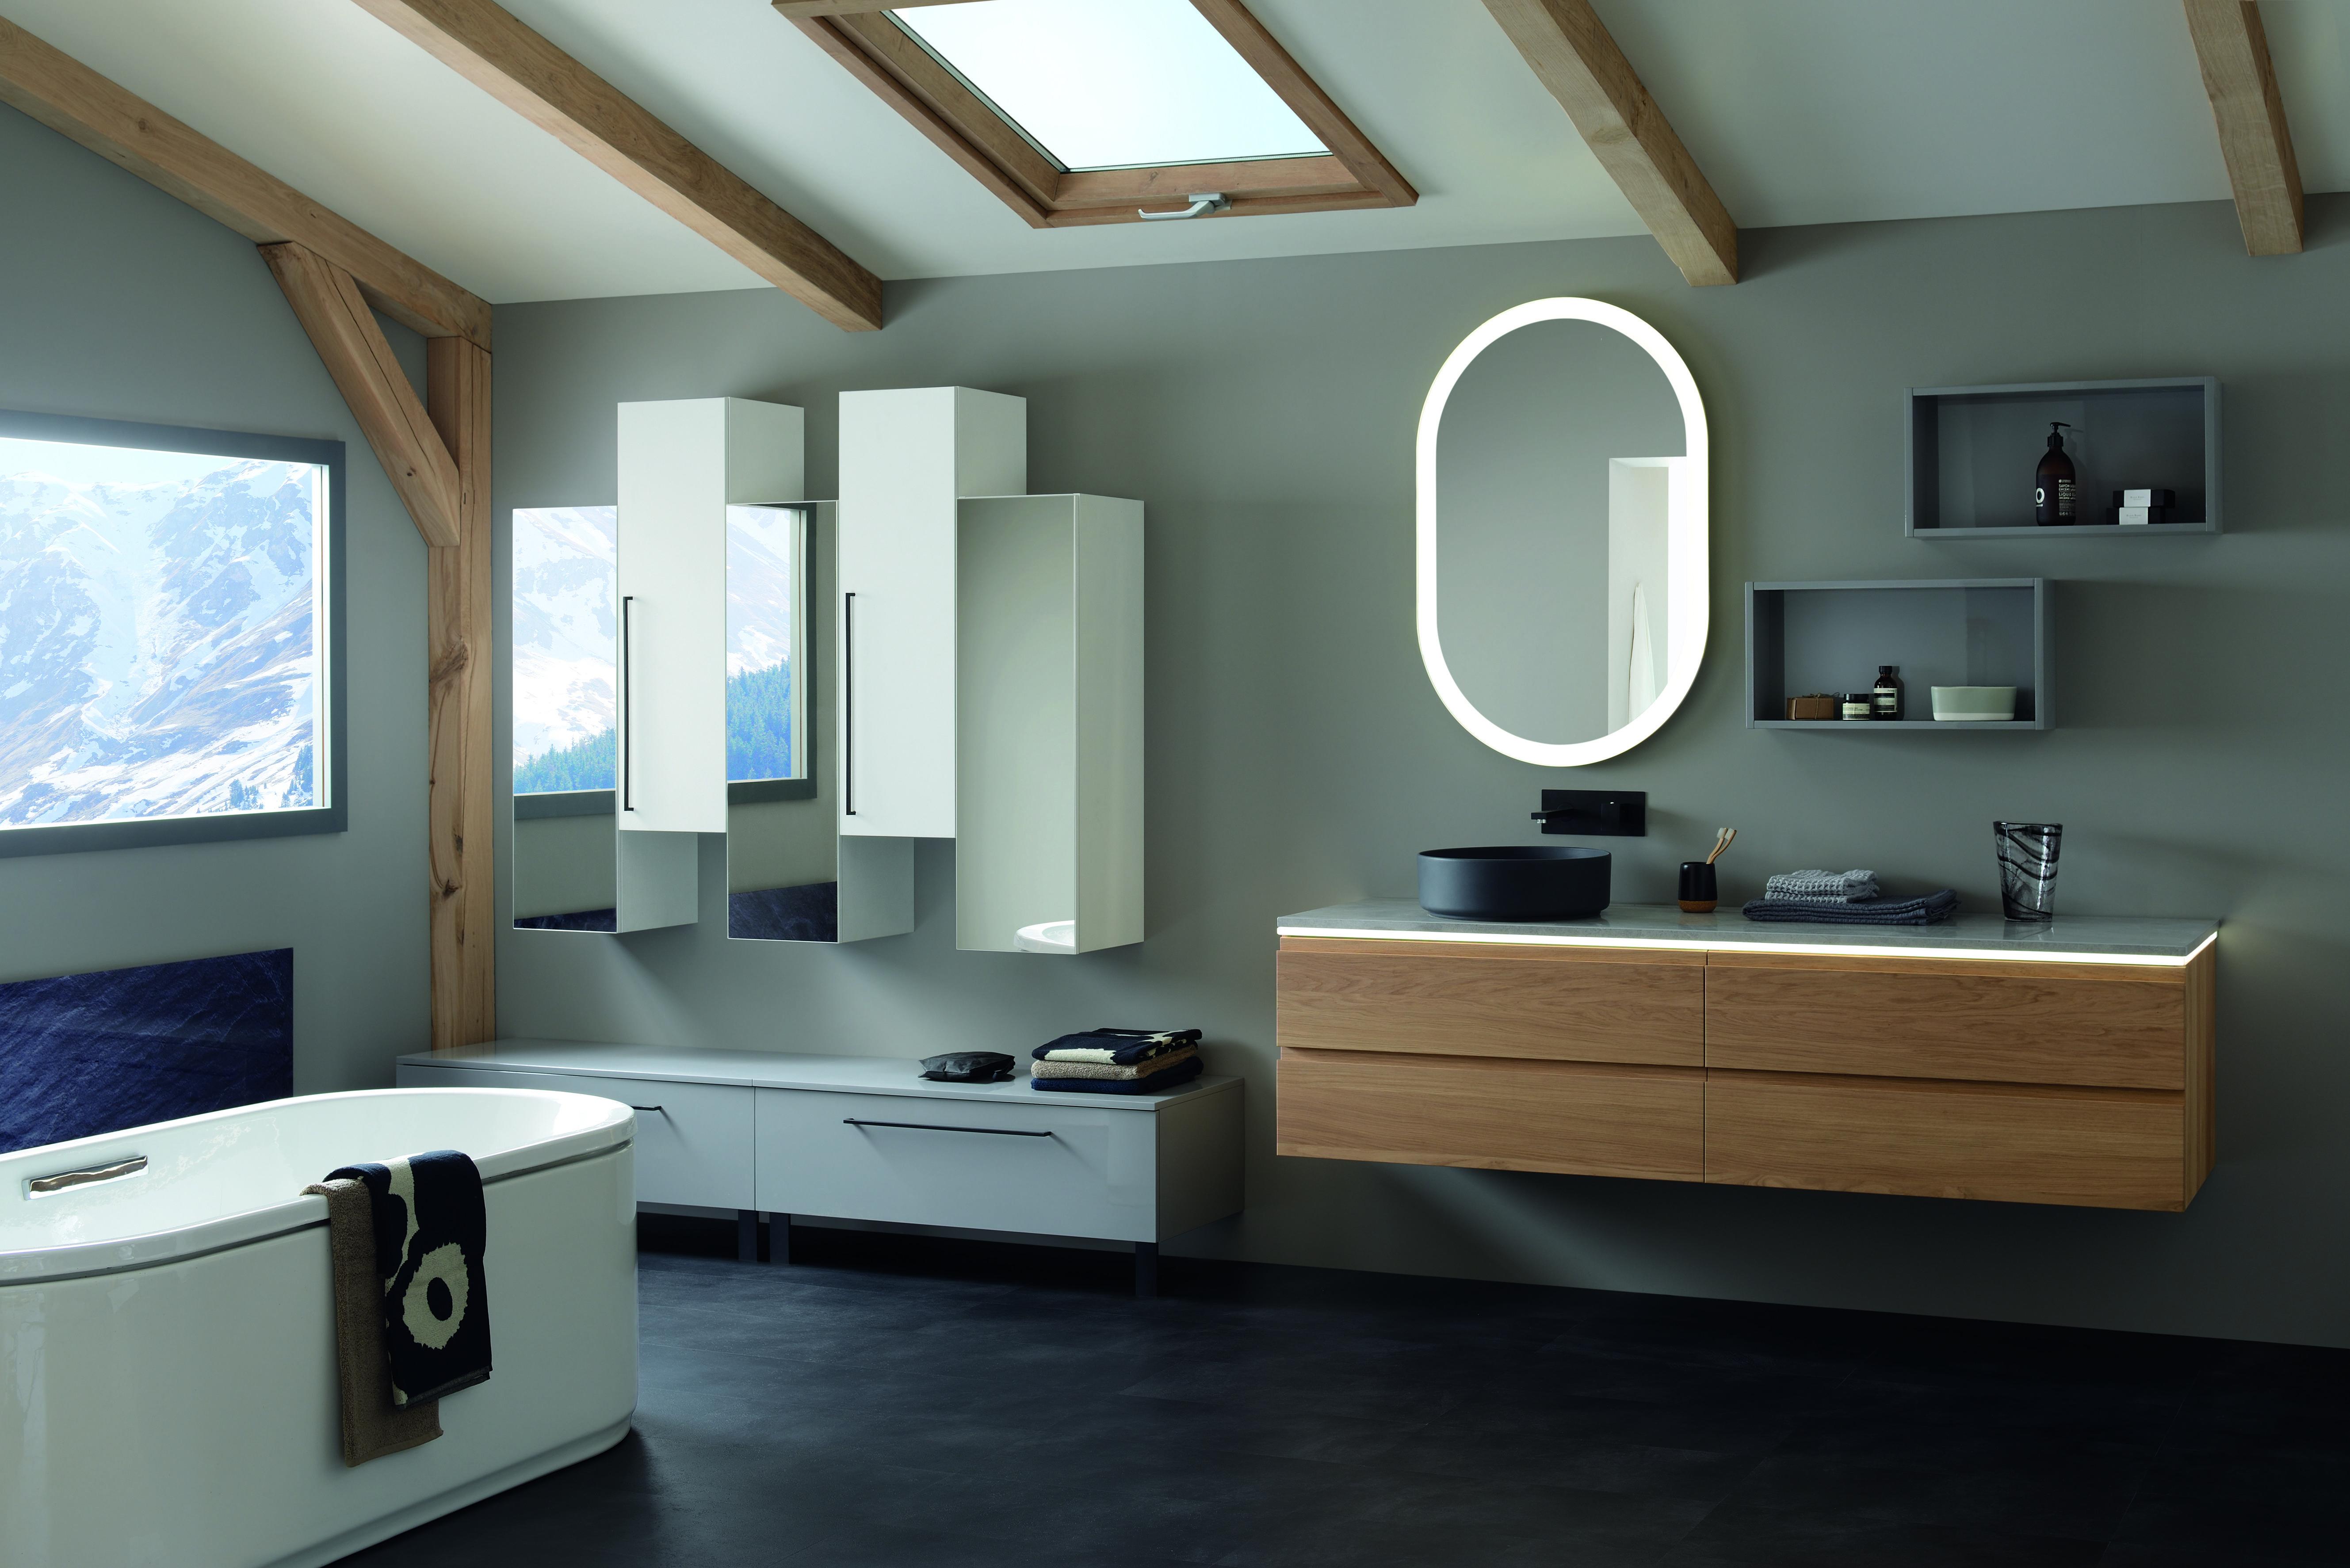 badkamermeubel meuble salle de bains sanijura illusion lumen les styles de stijlen en. Black Bedroom Furniture Sets. Home Design Ideas